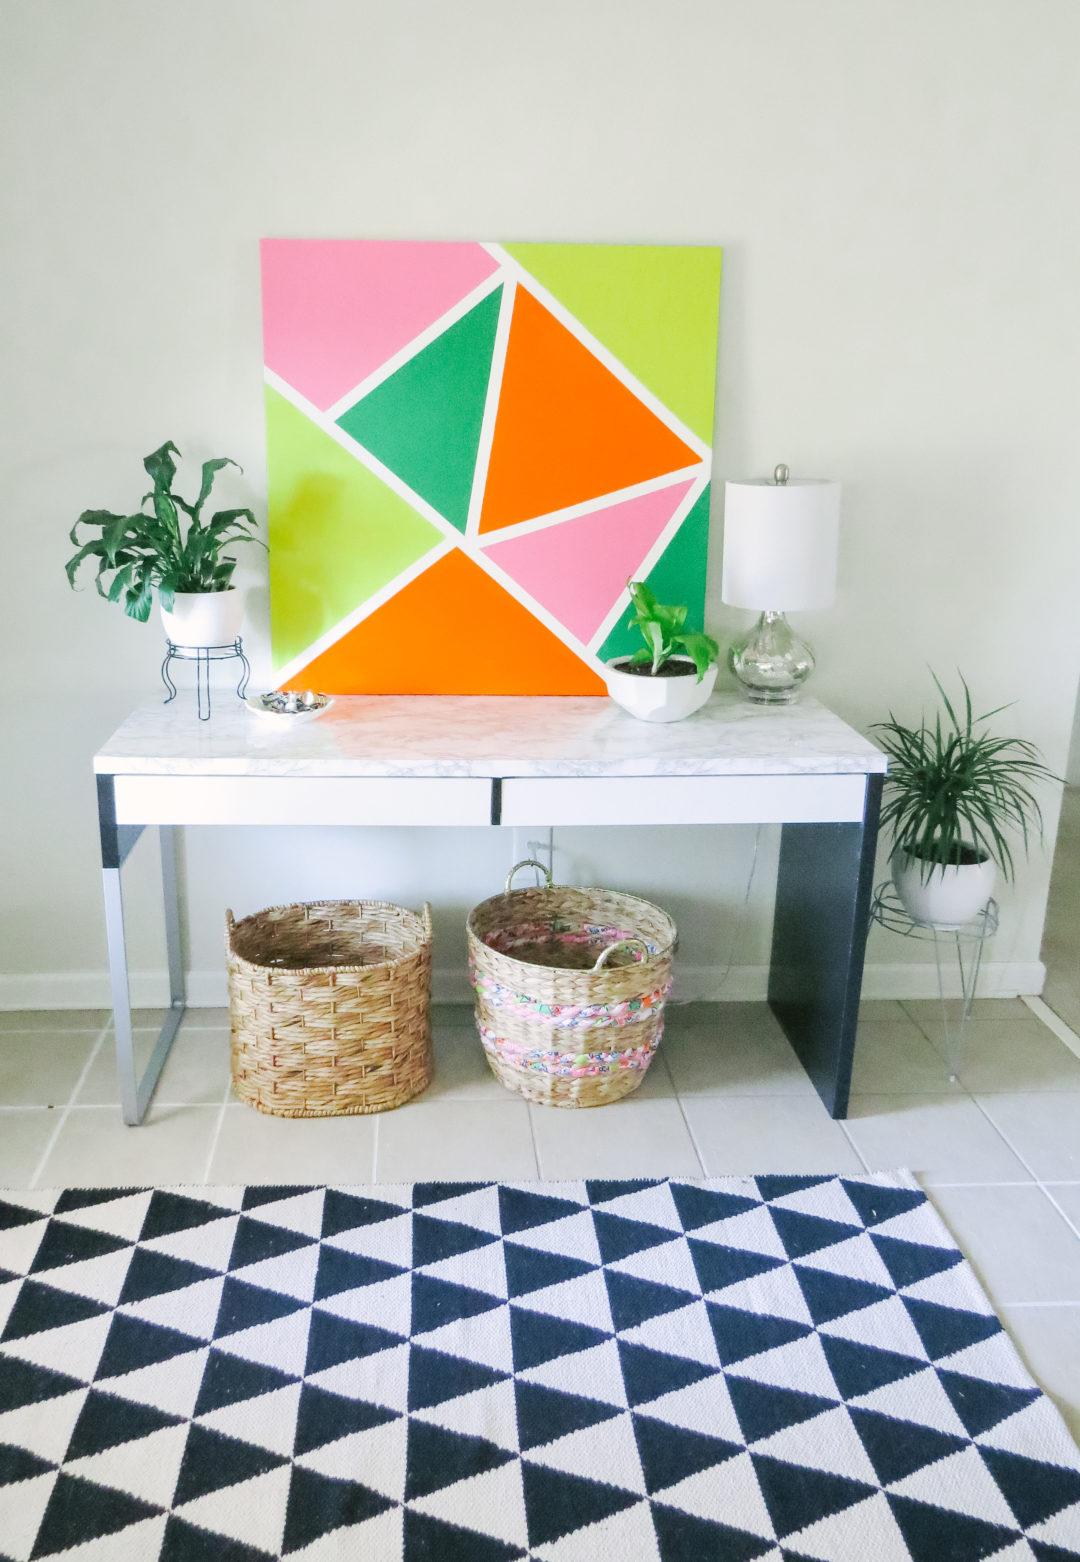 Wall Decoration Ideas - DIY Abstract Painting • Carla ...